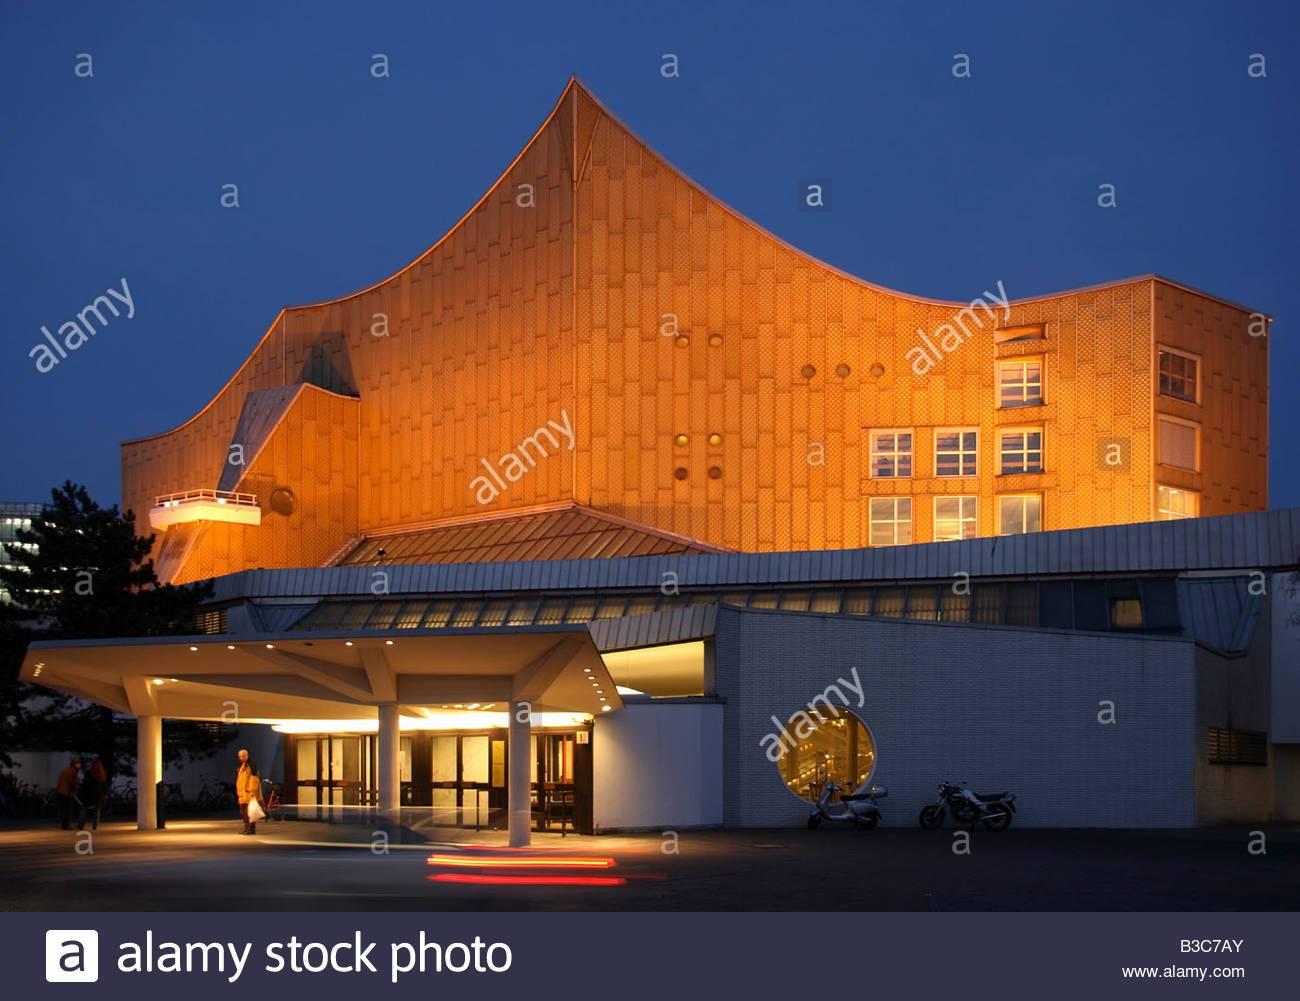 Берлинский филармонический оркестр (berliner philharmoniker) | belcanto.ru